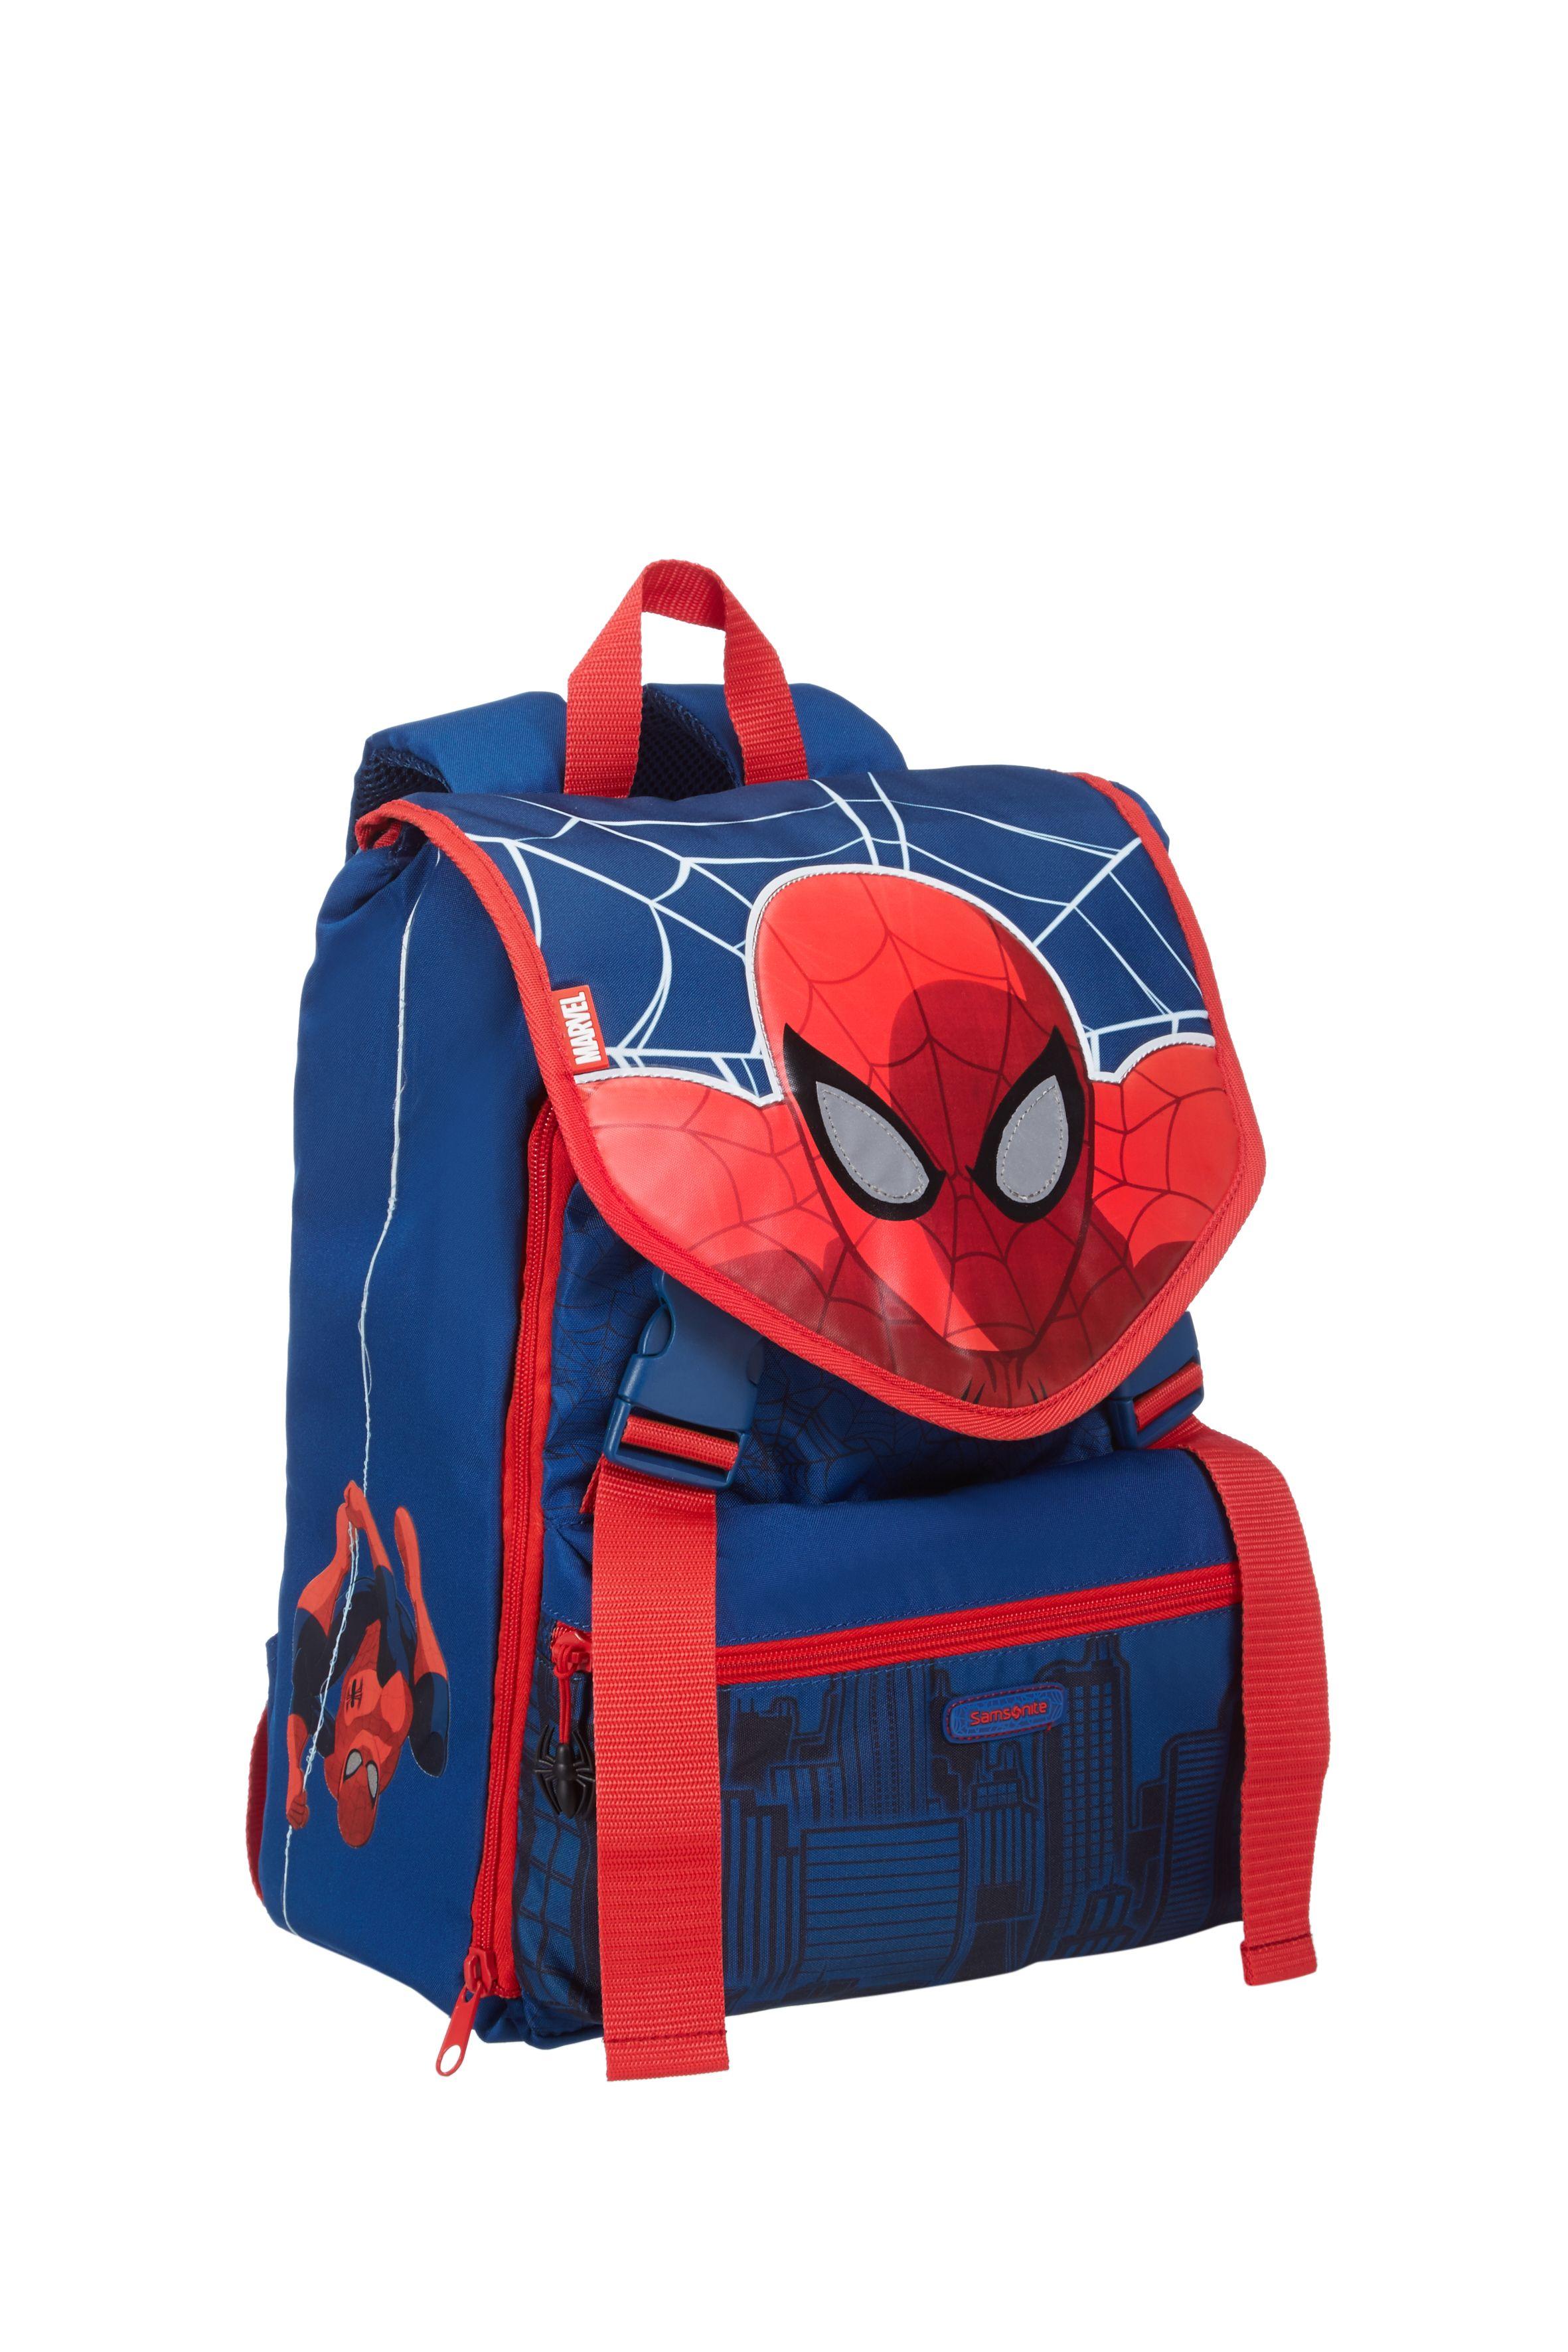 02f171bf744 Marvel Wonder - Spider-Man Ergonomic Backpack #Disney #Samsonite #Marvel # SpiderMan #Travel #Kids #School #Schoolbag #MySamsonite #ByYourSide